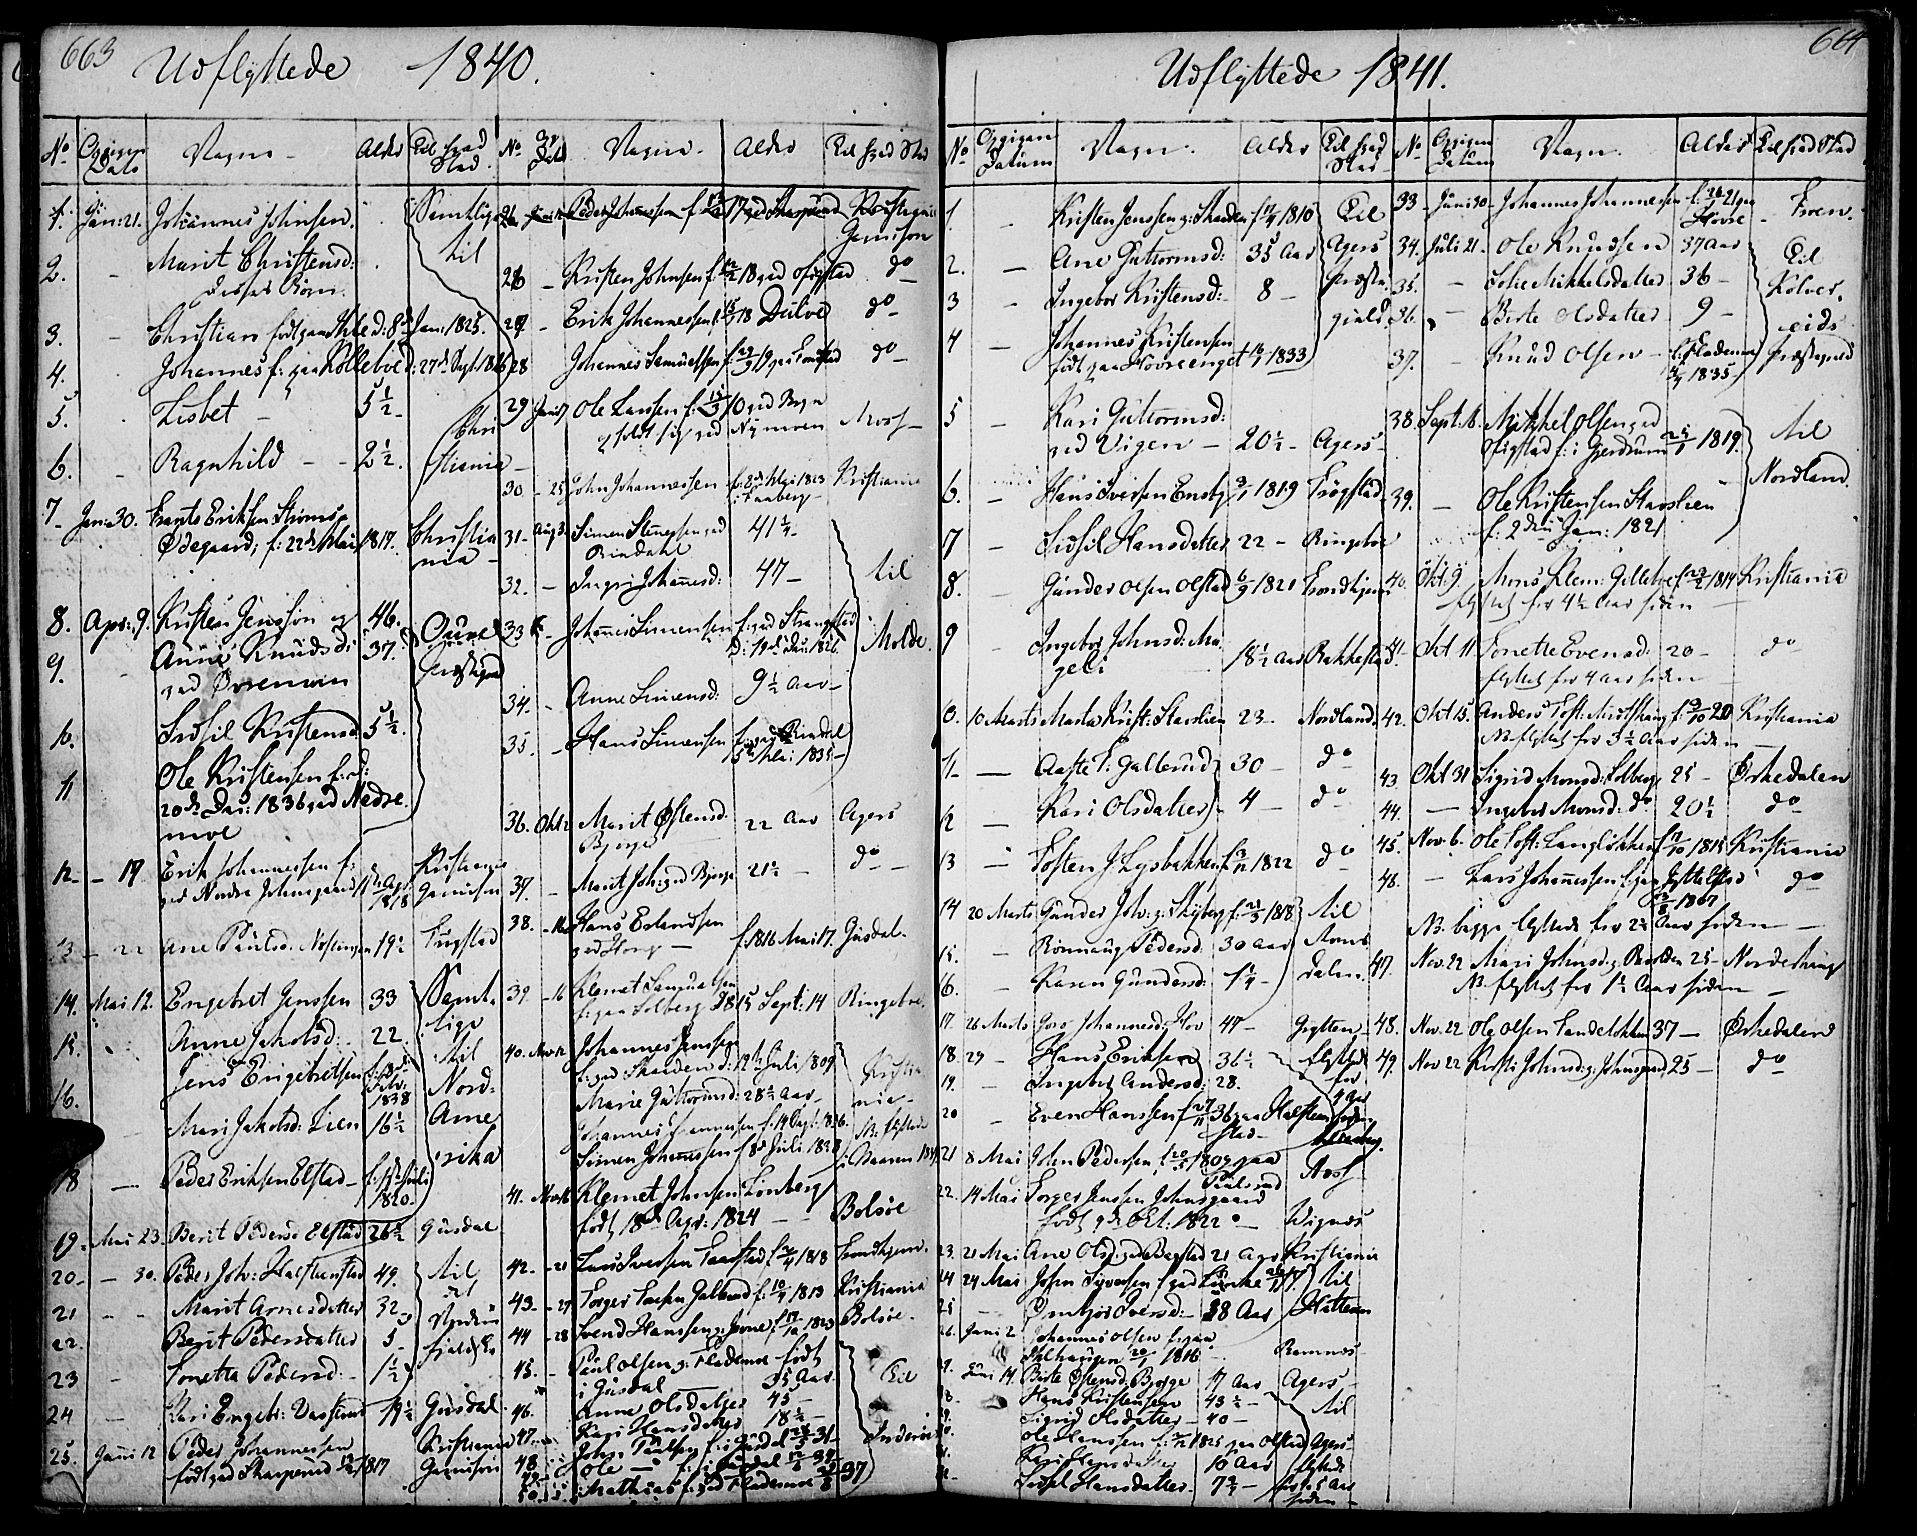 SAH, Øyer prestekontor, Ministerialbok nr. 4, 1824-1841, s. 663-664